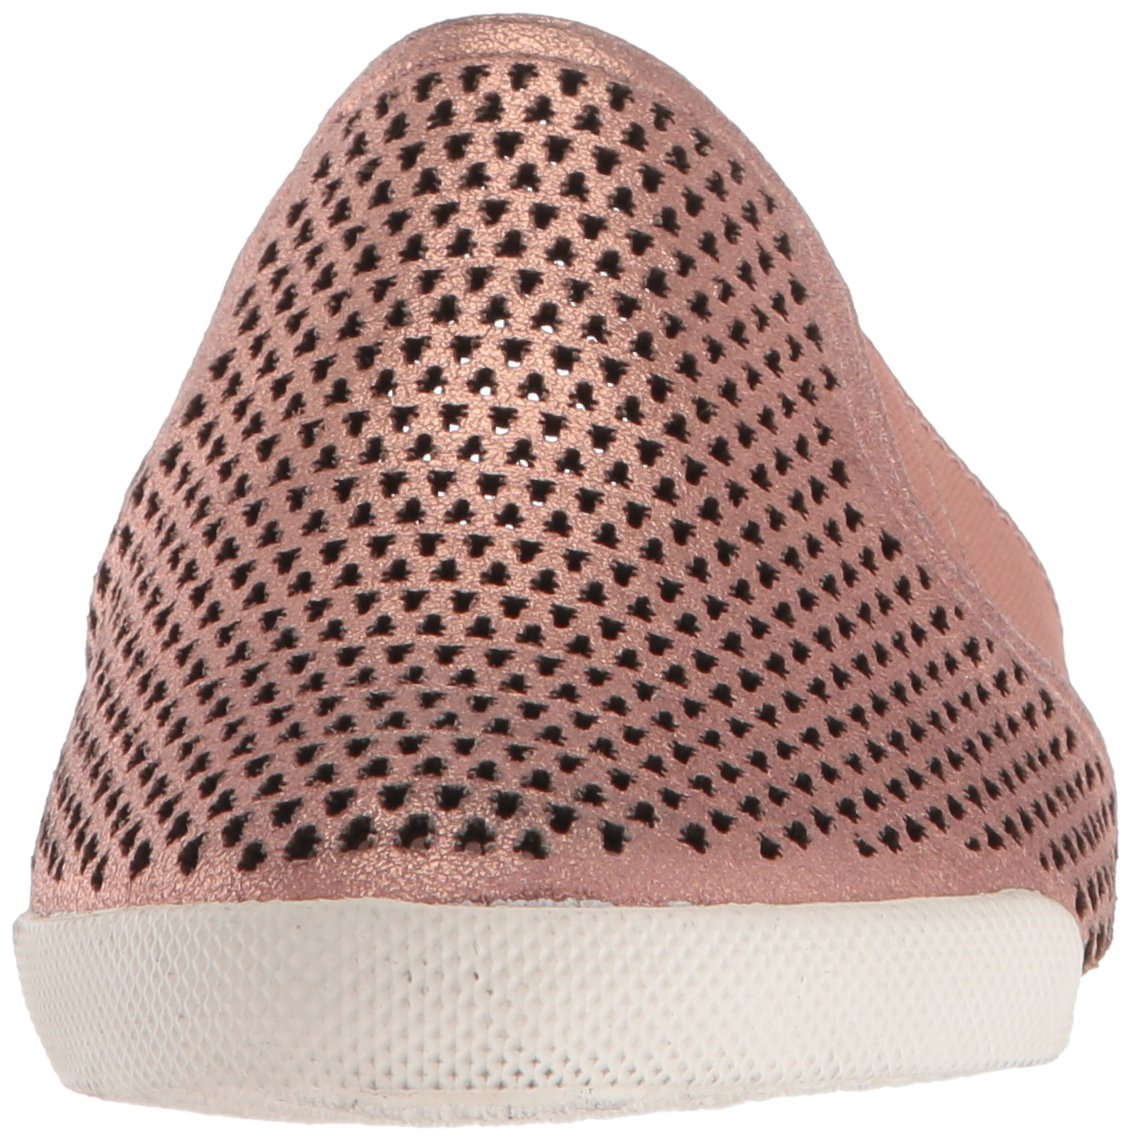 FRYE Women's B074QSTZ9Z Melanie Perf Mule Sneaker B074QSTZ9Z Women's 7 B(M) US|Rose Gold 4a2ad1